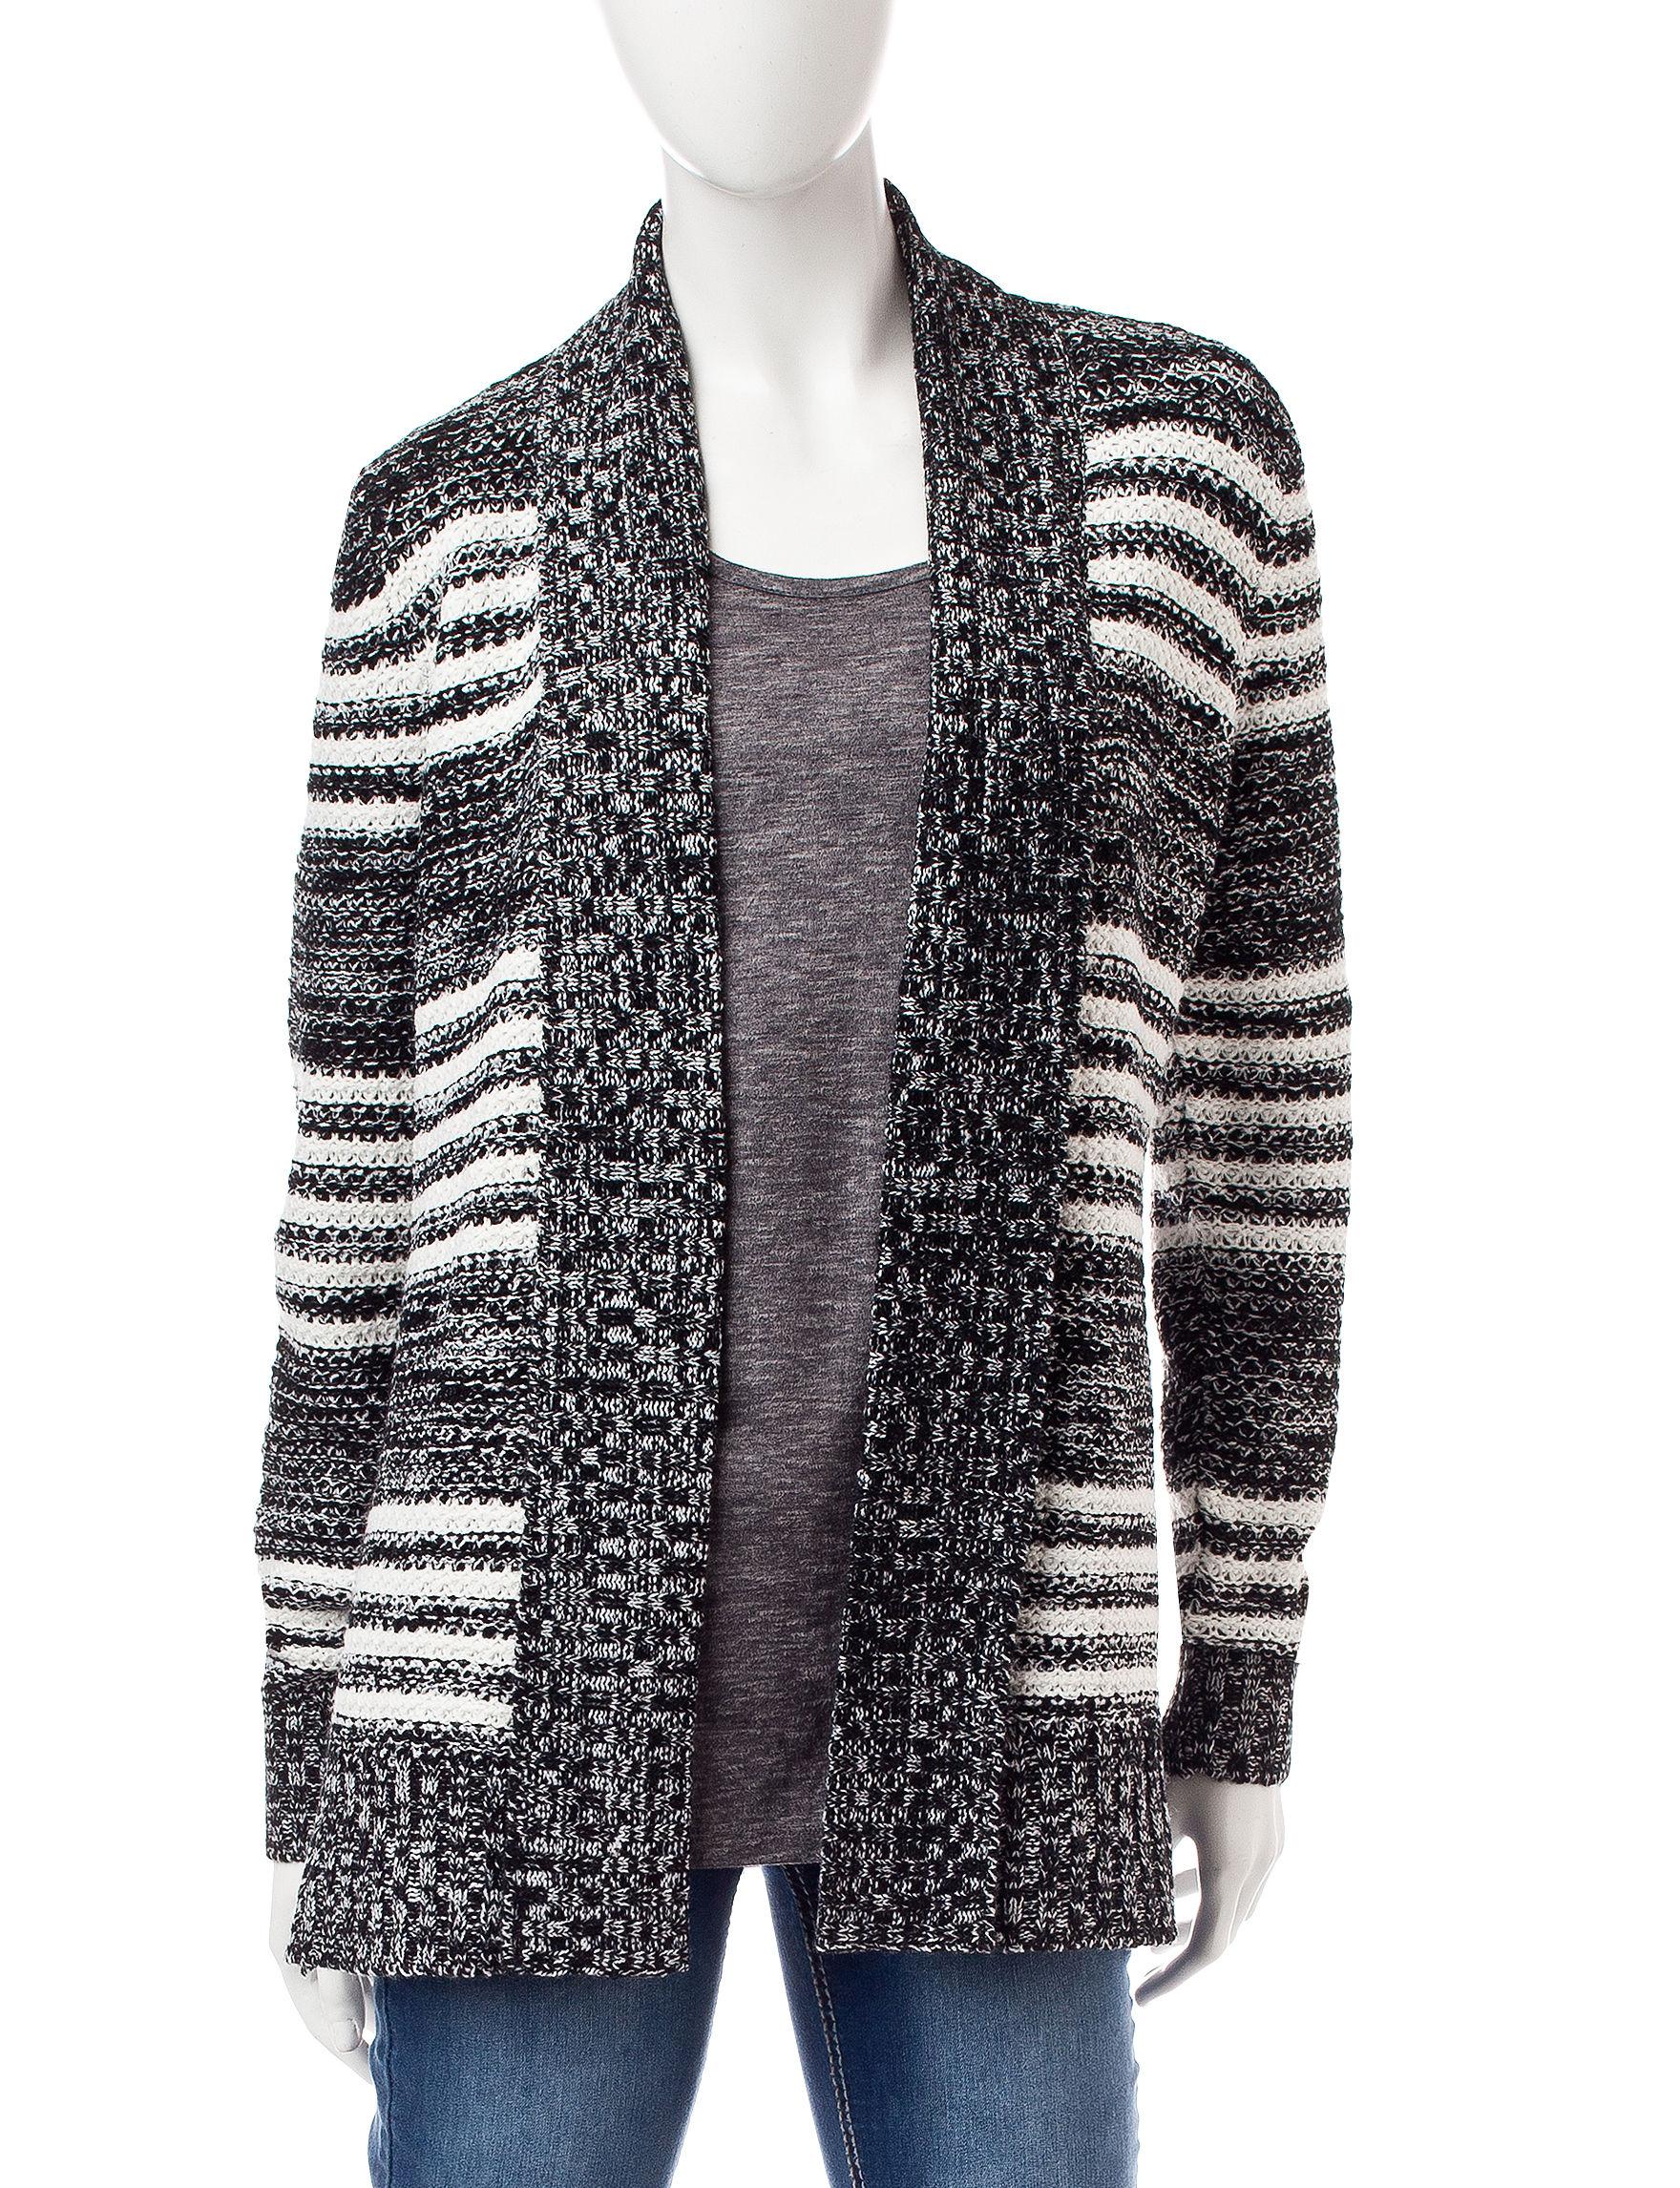 Fresh White / Black Cardigans Sweaters